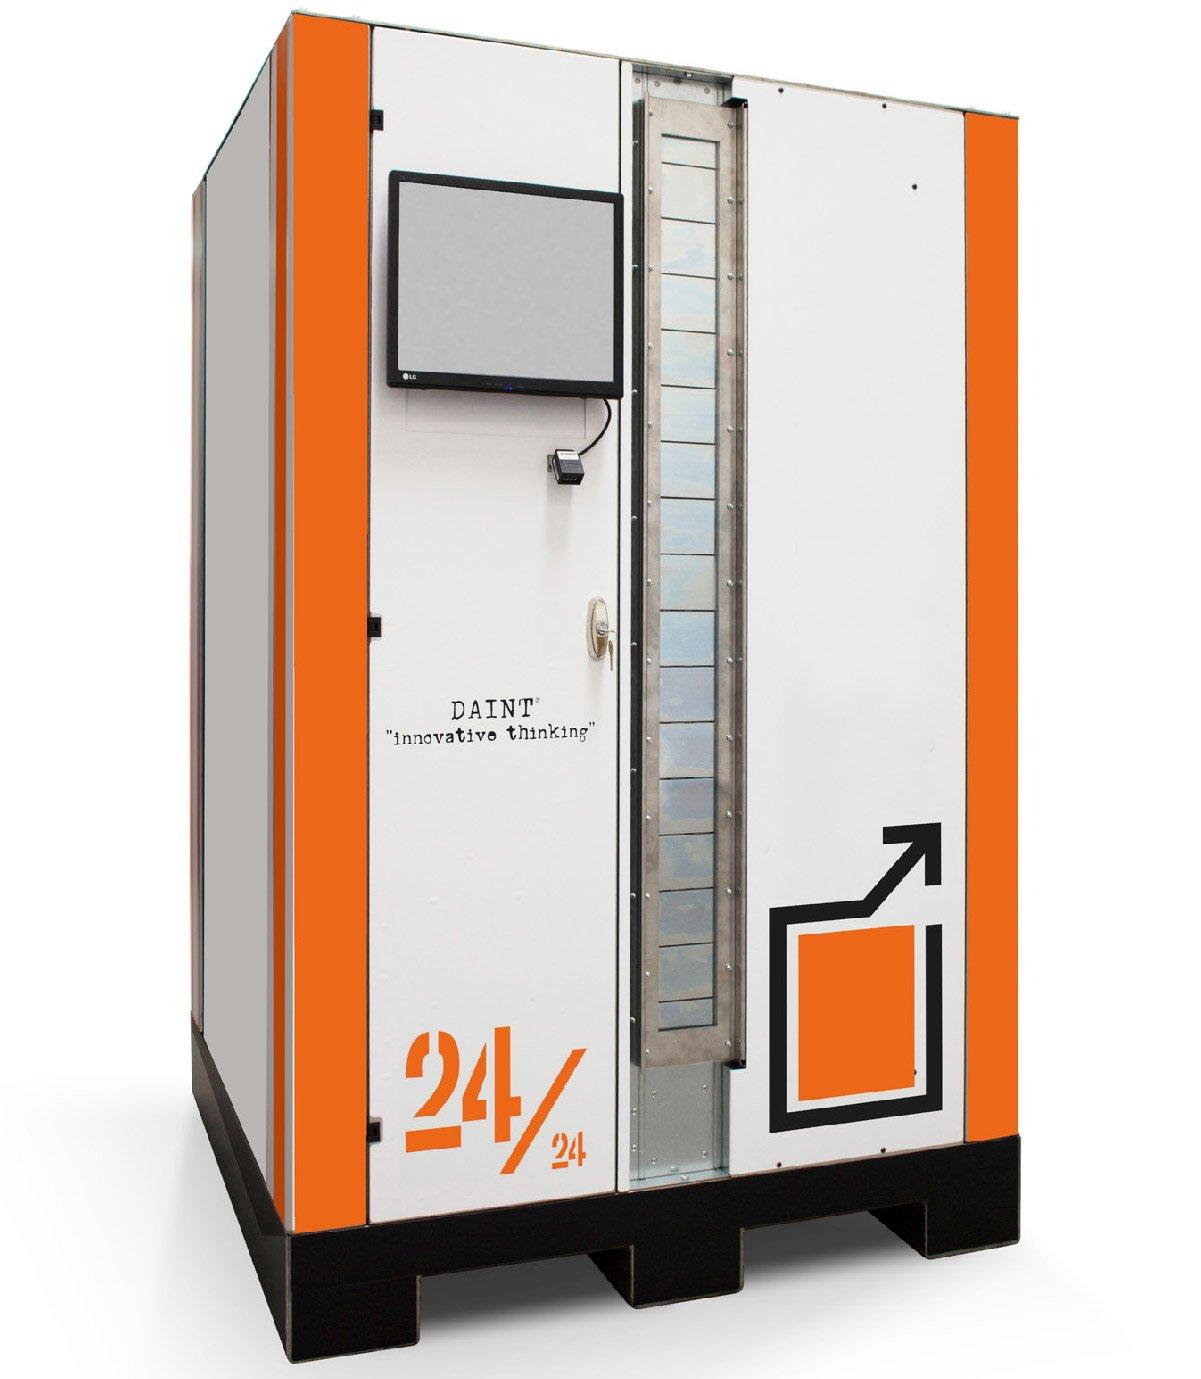 TOOLMAT24 Vertical Maxi - Daint srl Distributori Automatici